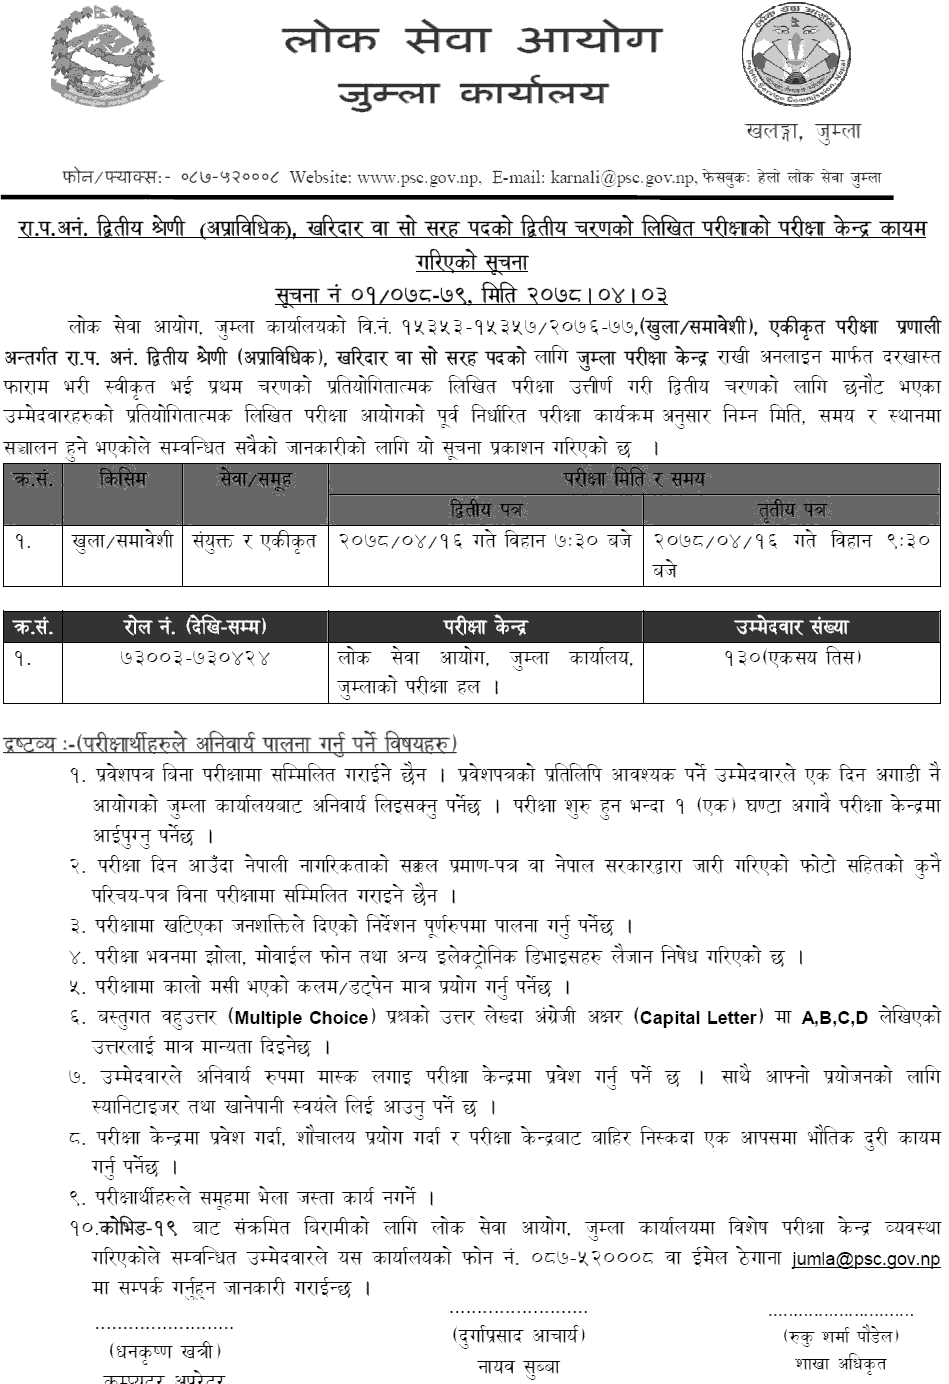 7) Lok Sewa Aayog Jumla (Kharidar Second Phase Written Exam Center)